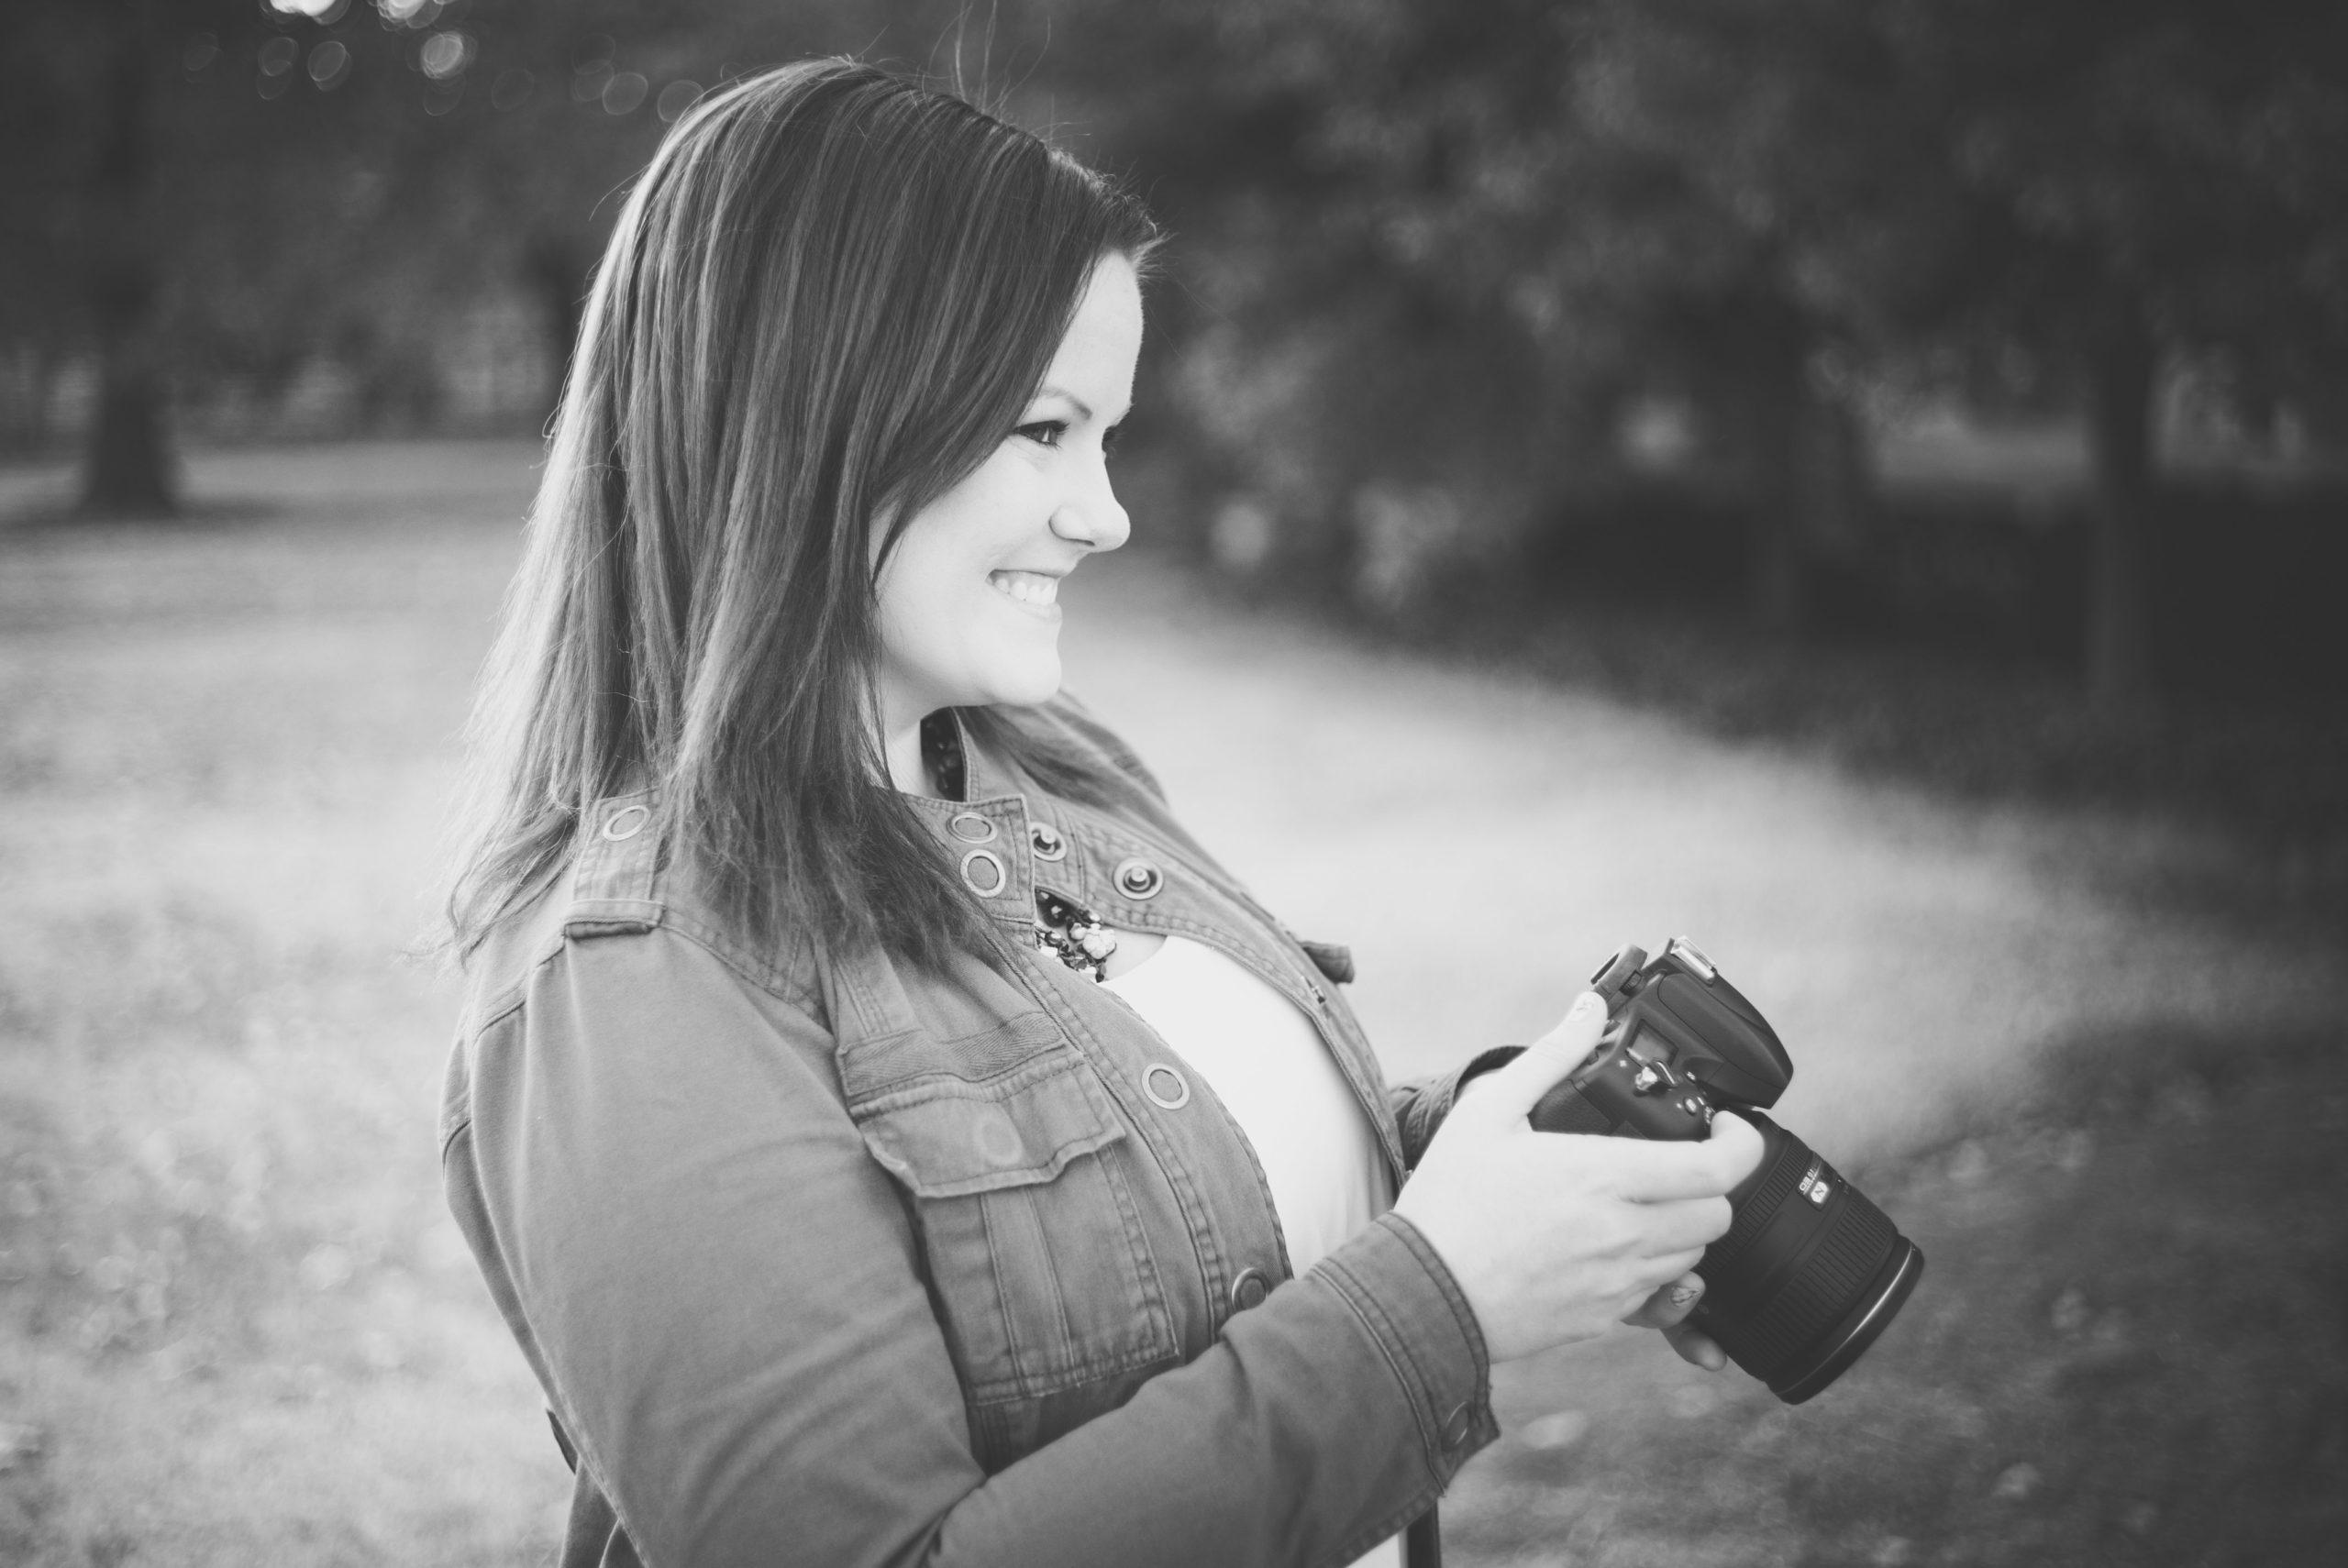 photographerheadshots (77 of 122)